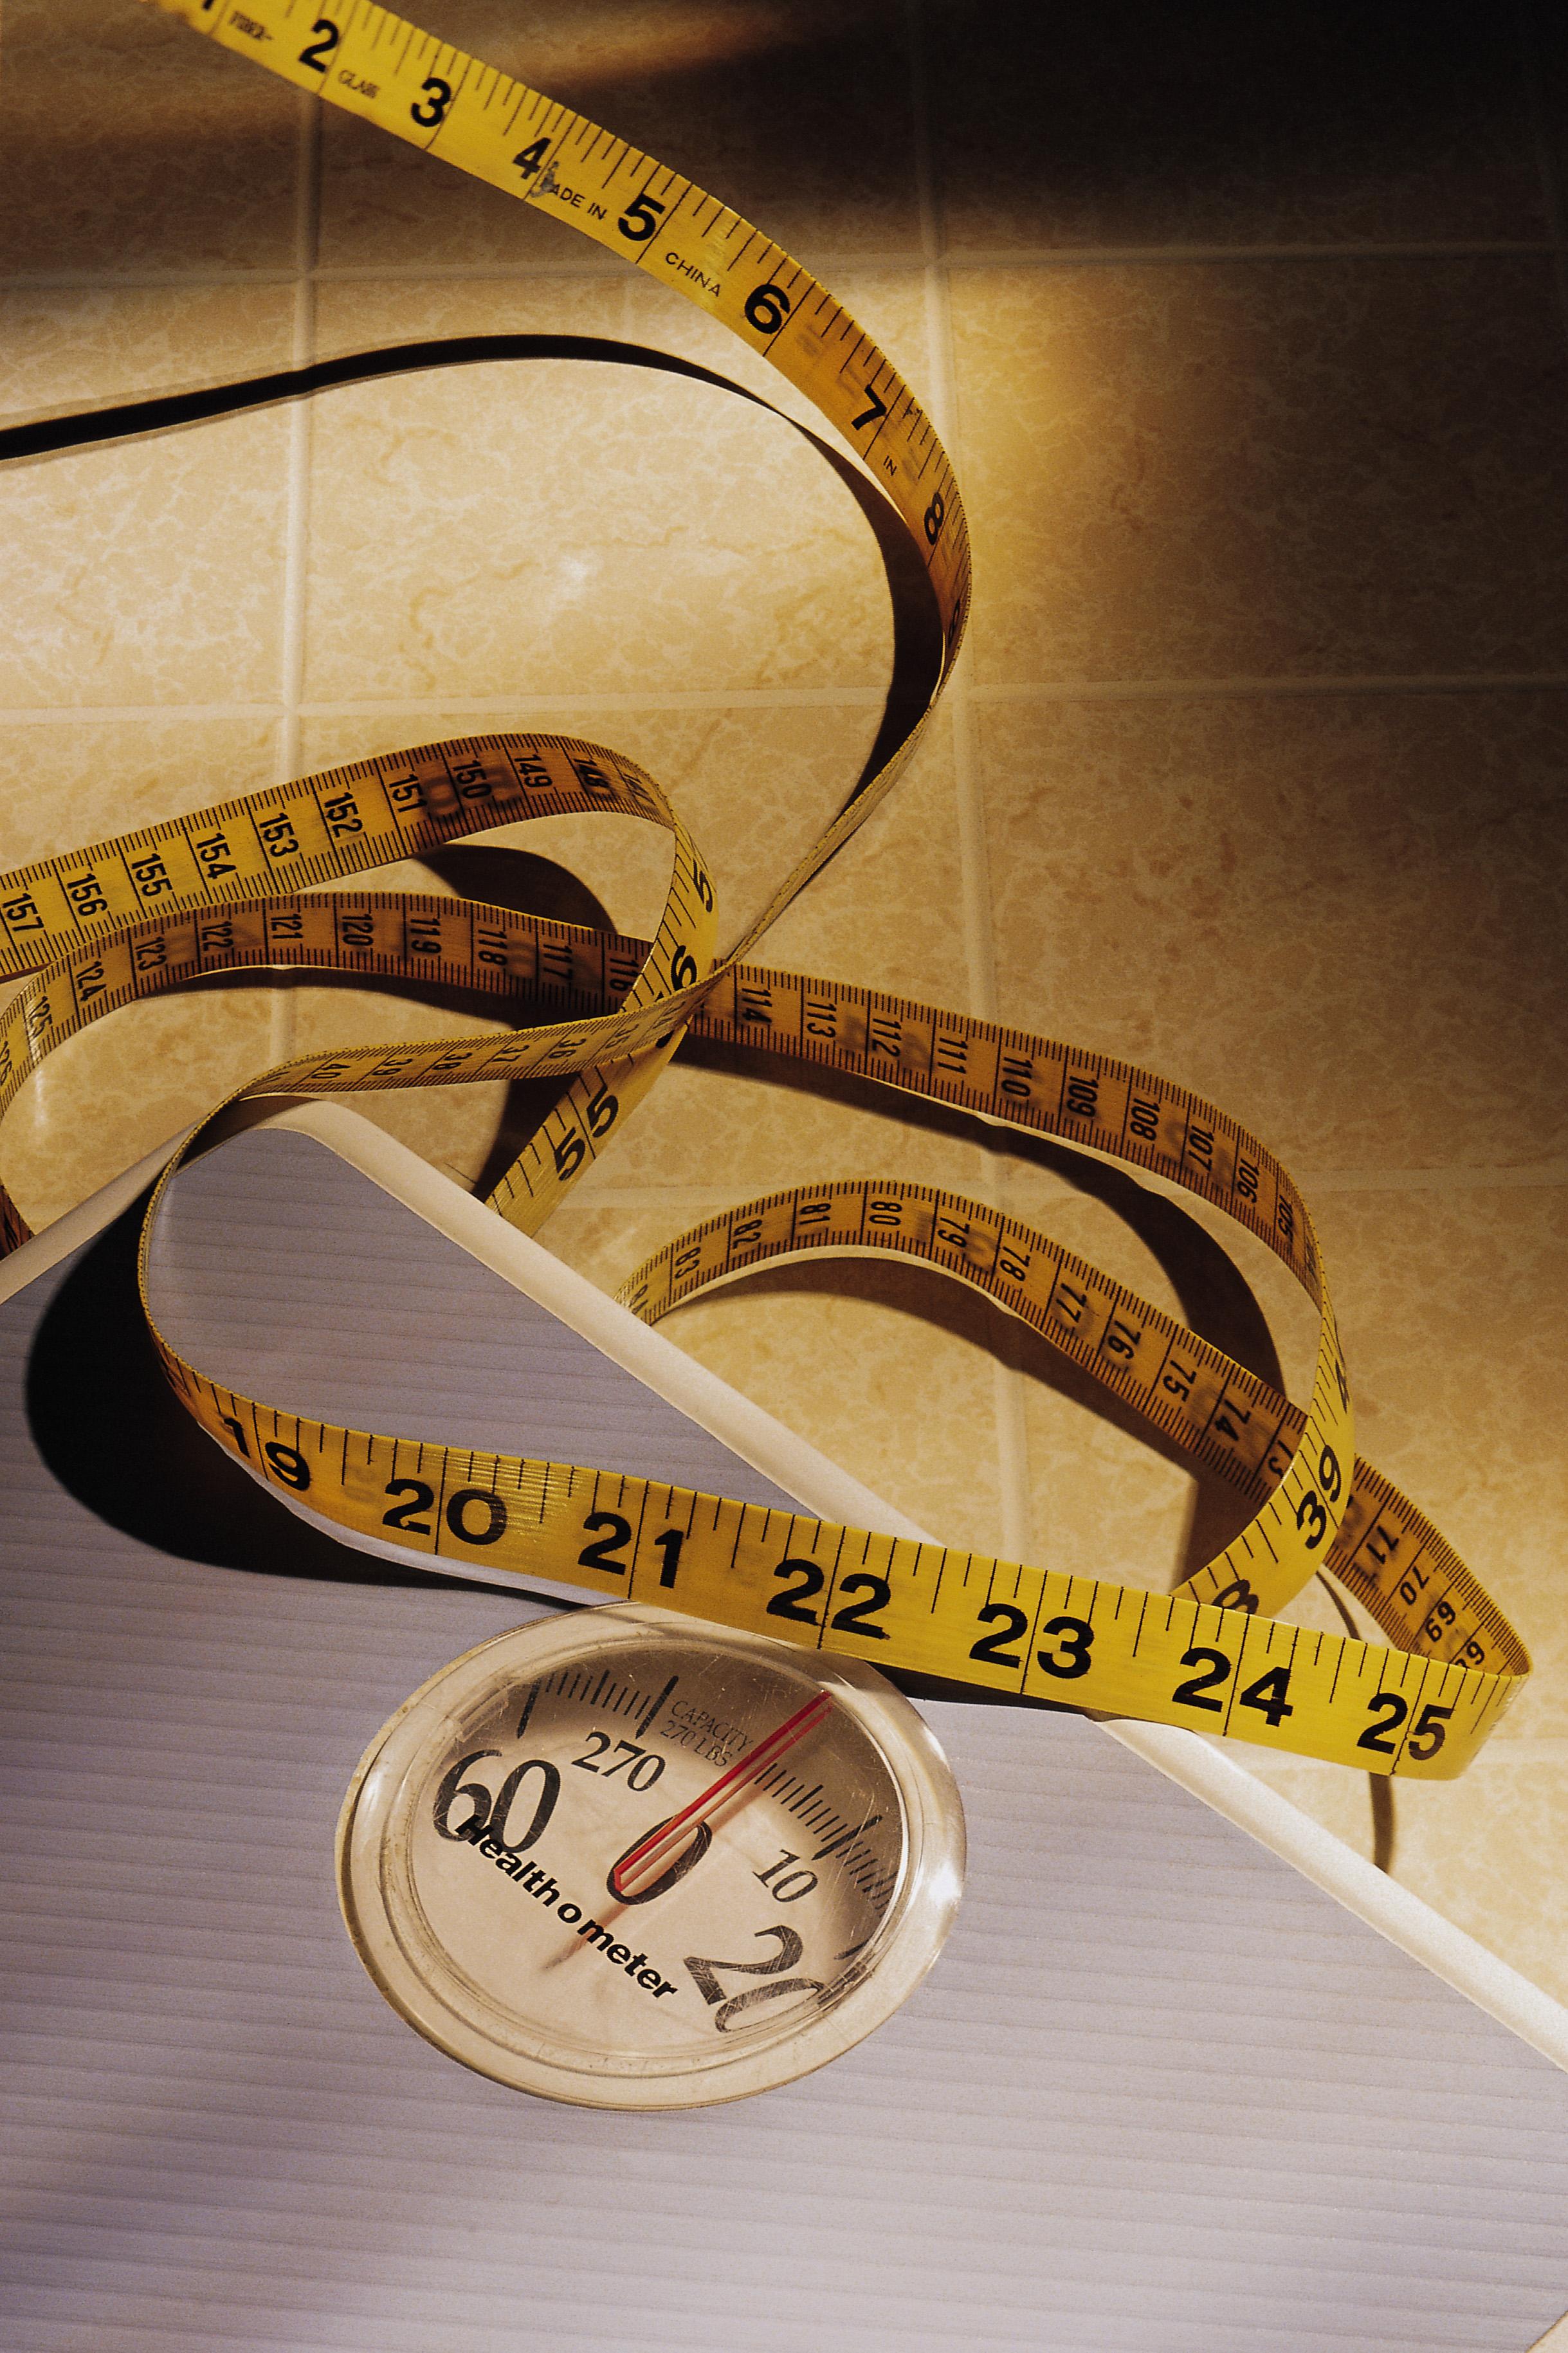 Can laxatives make u lose weight photo 9